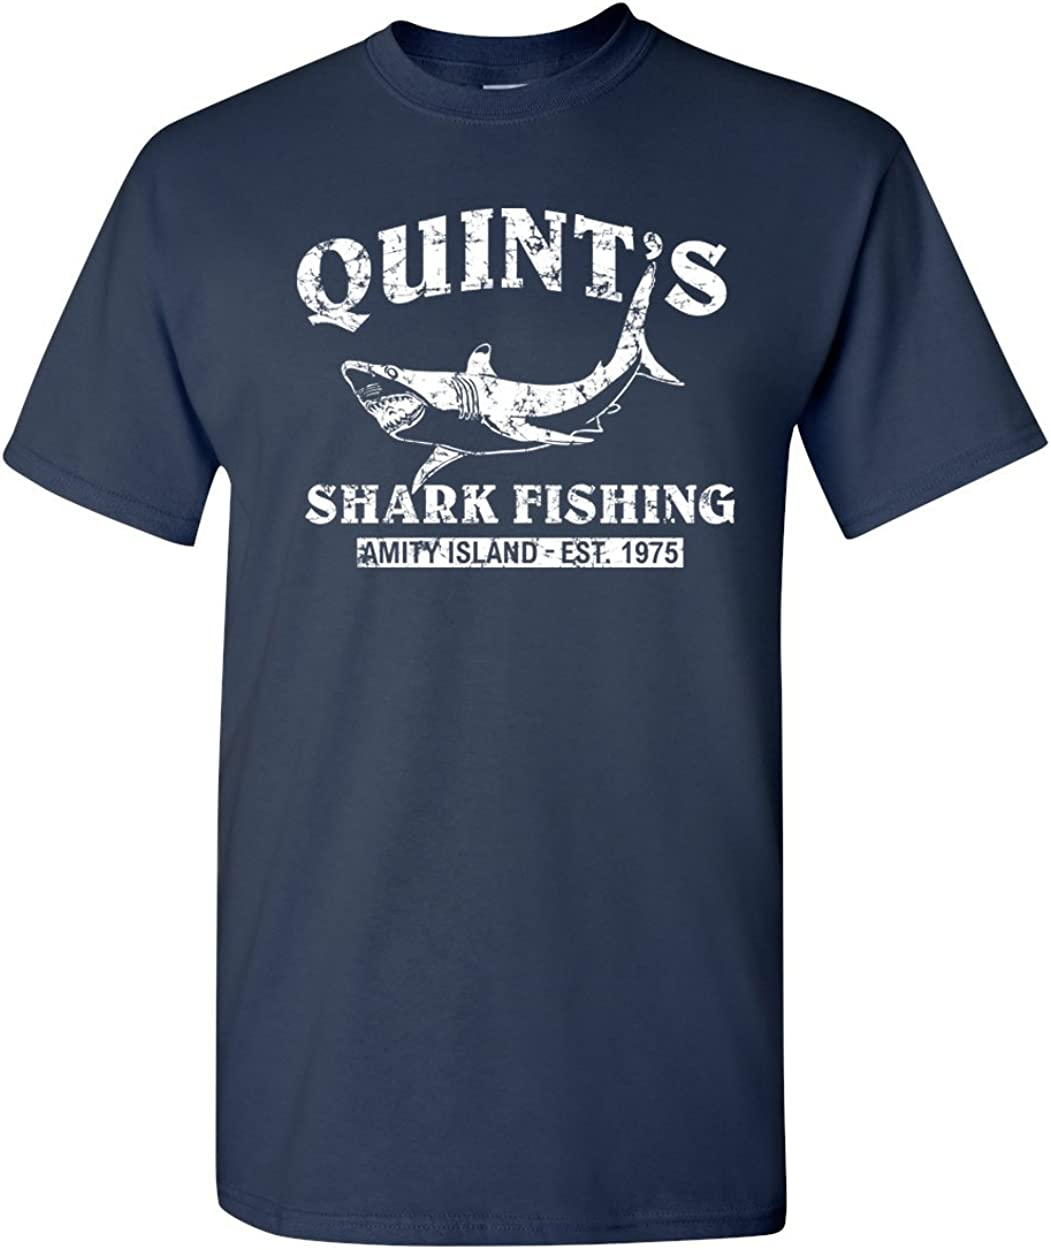 Quint's Shark Fishing - Jaws Retro Men's T-Shirt